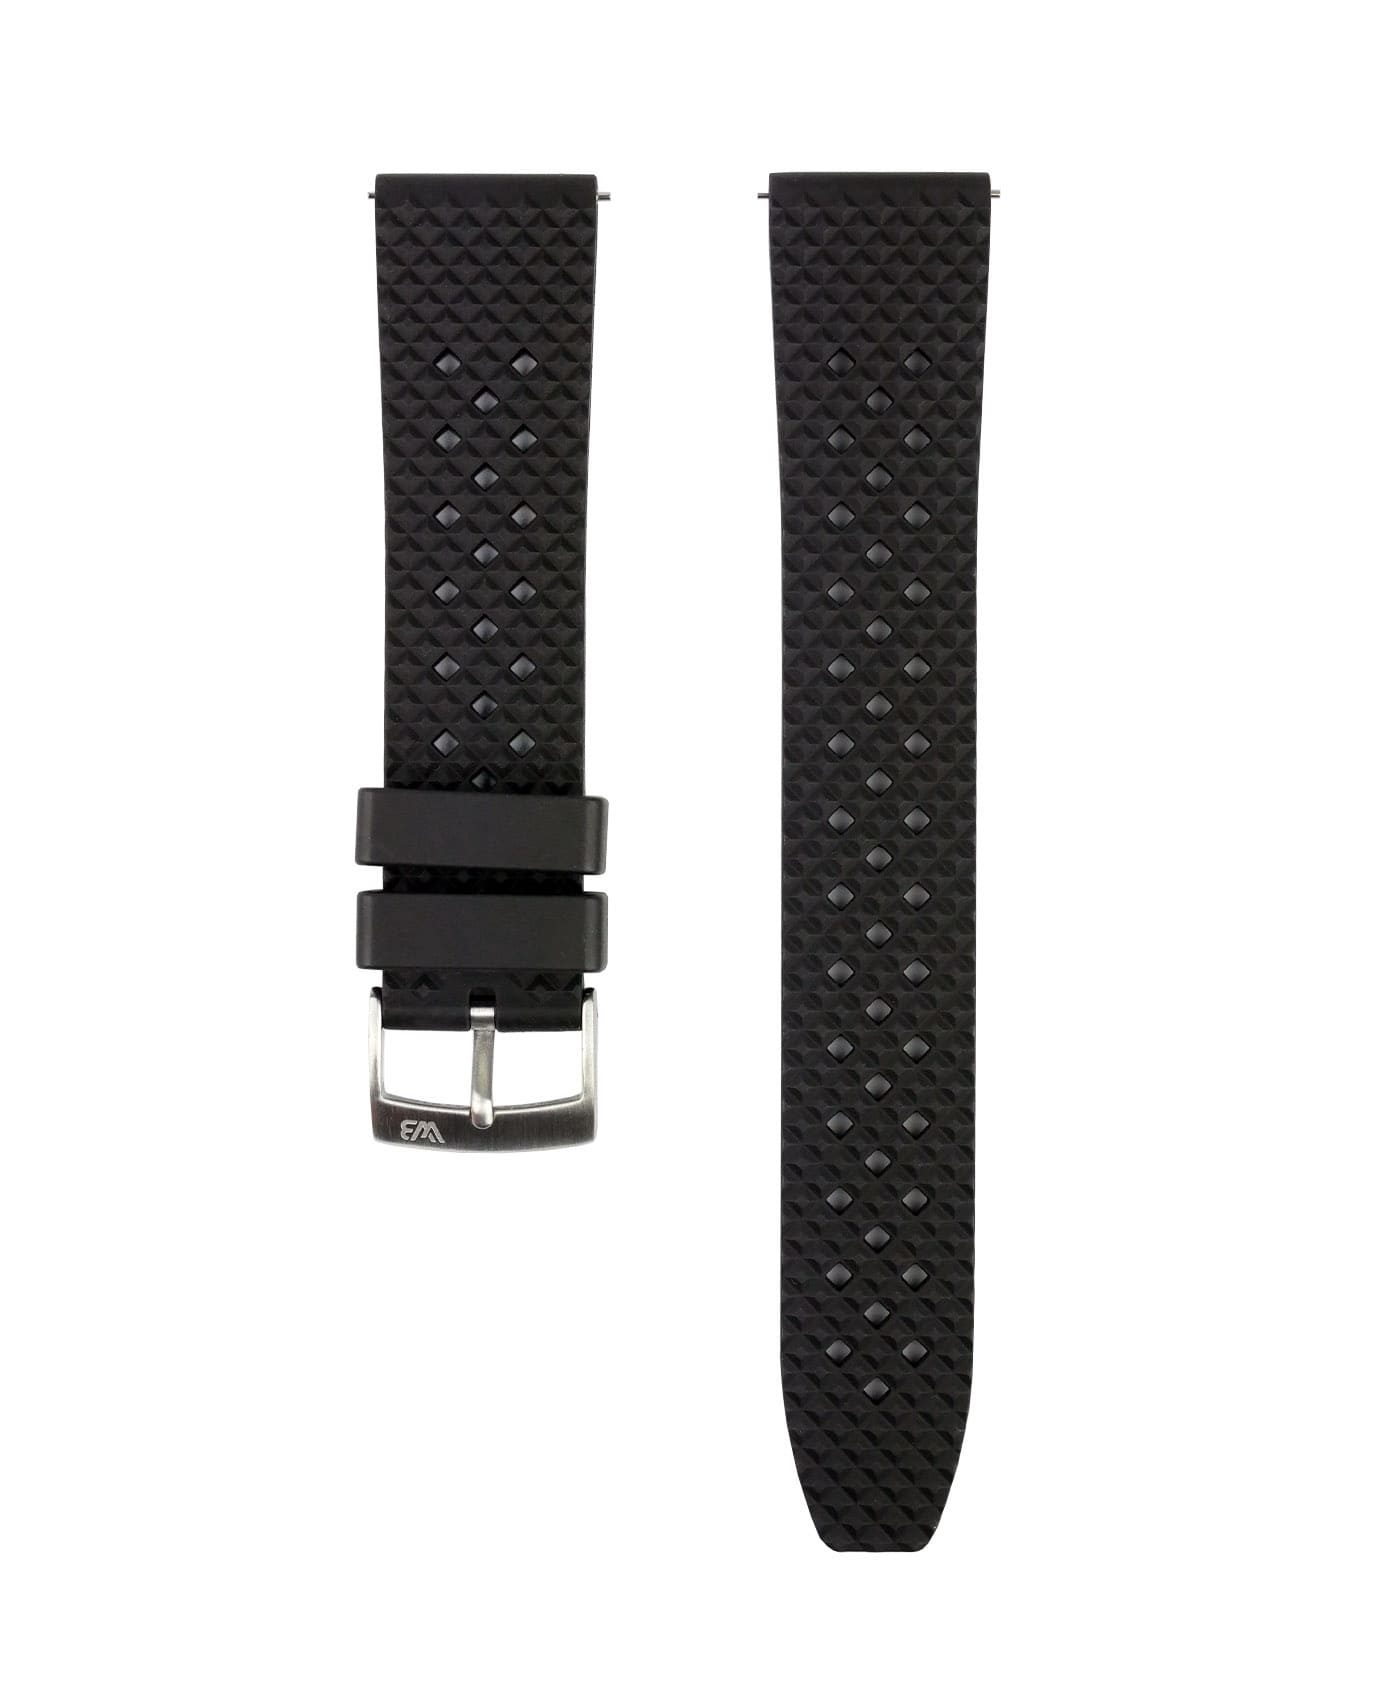 Rhombus FKM Rubber watch strap_Black_Front